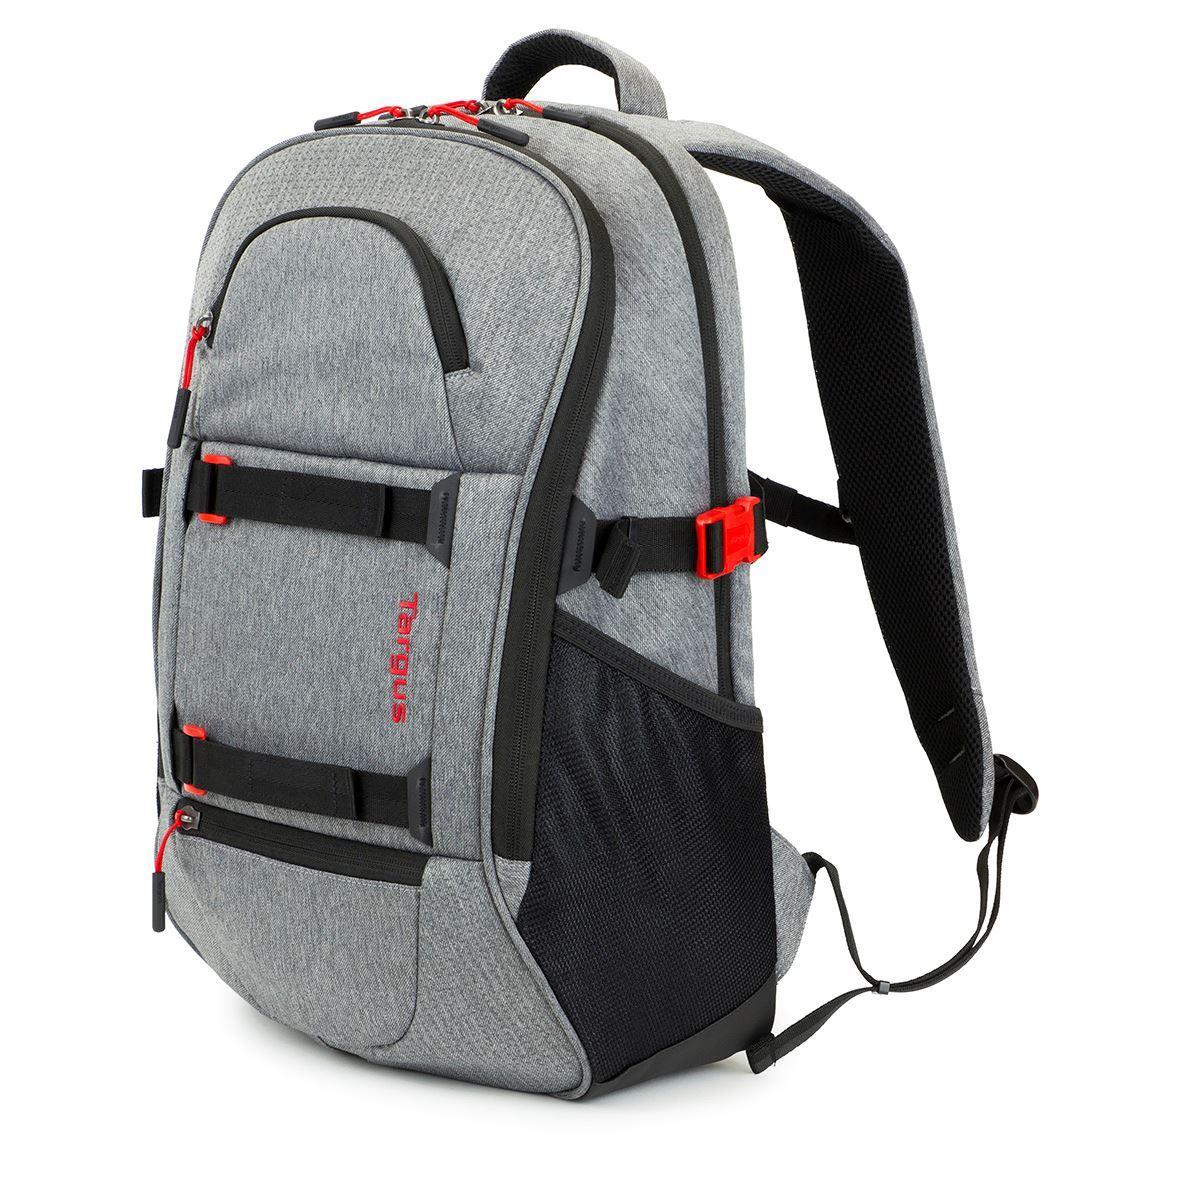 sac dos pour ordinateur portable targus urban explorer. Black Bedroom Furniture Sets. Home Design Ideas